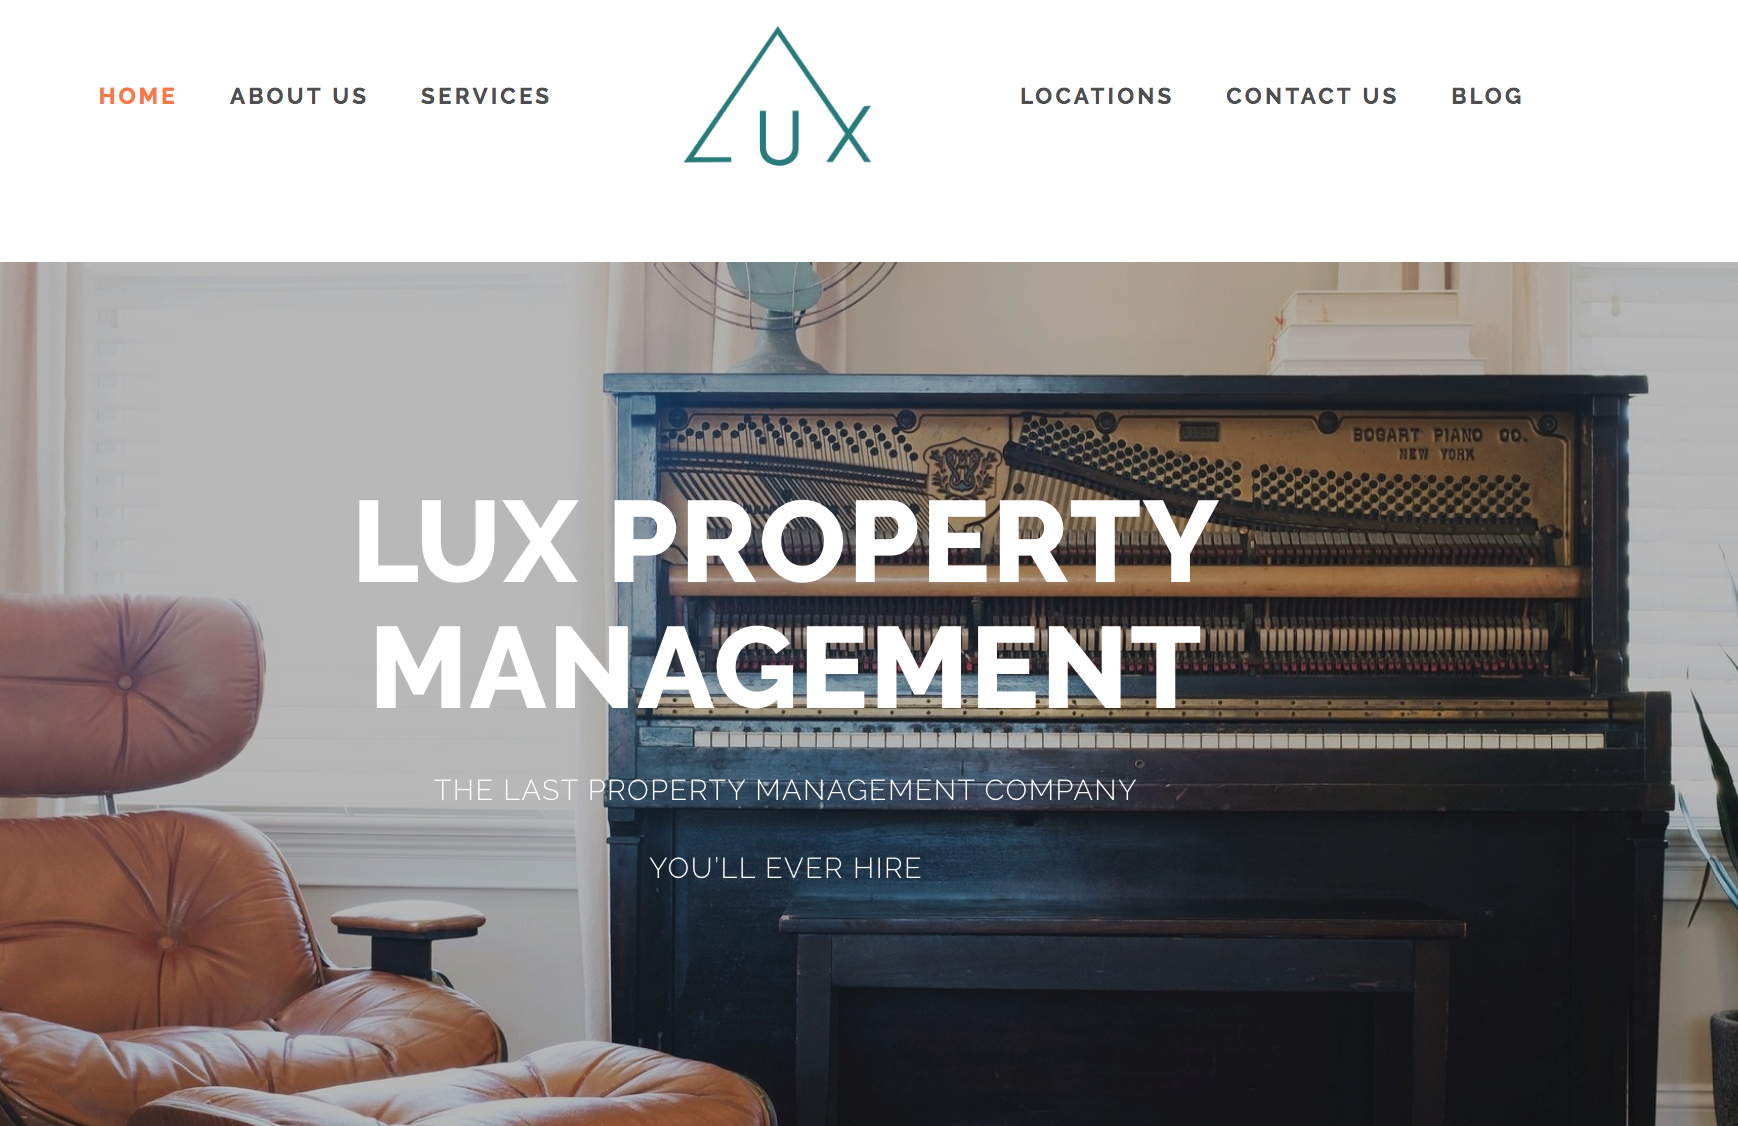 website launch and design portland